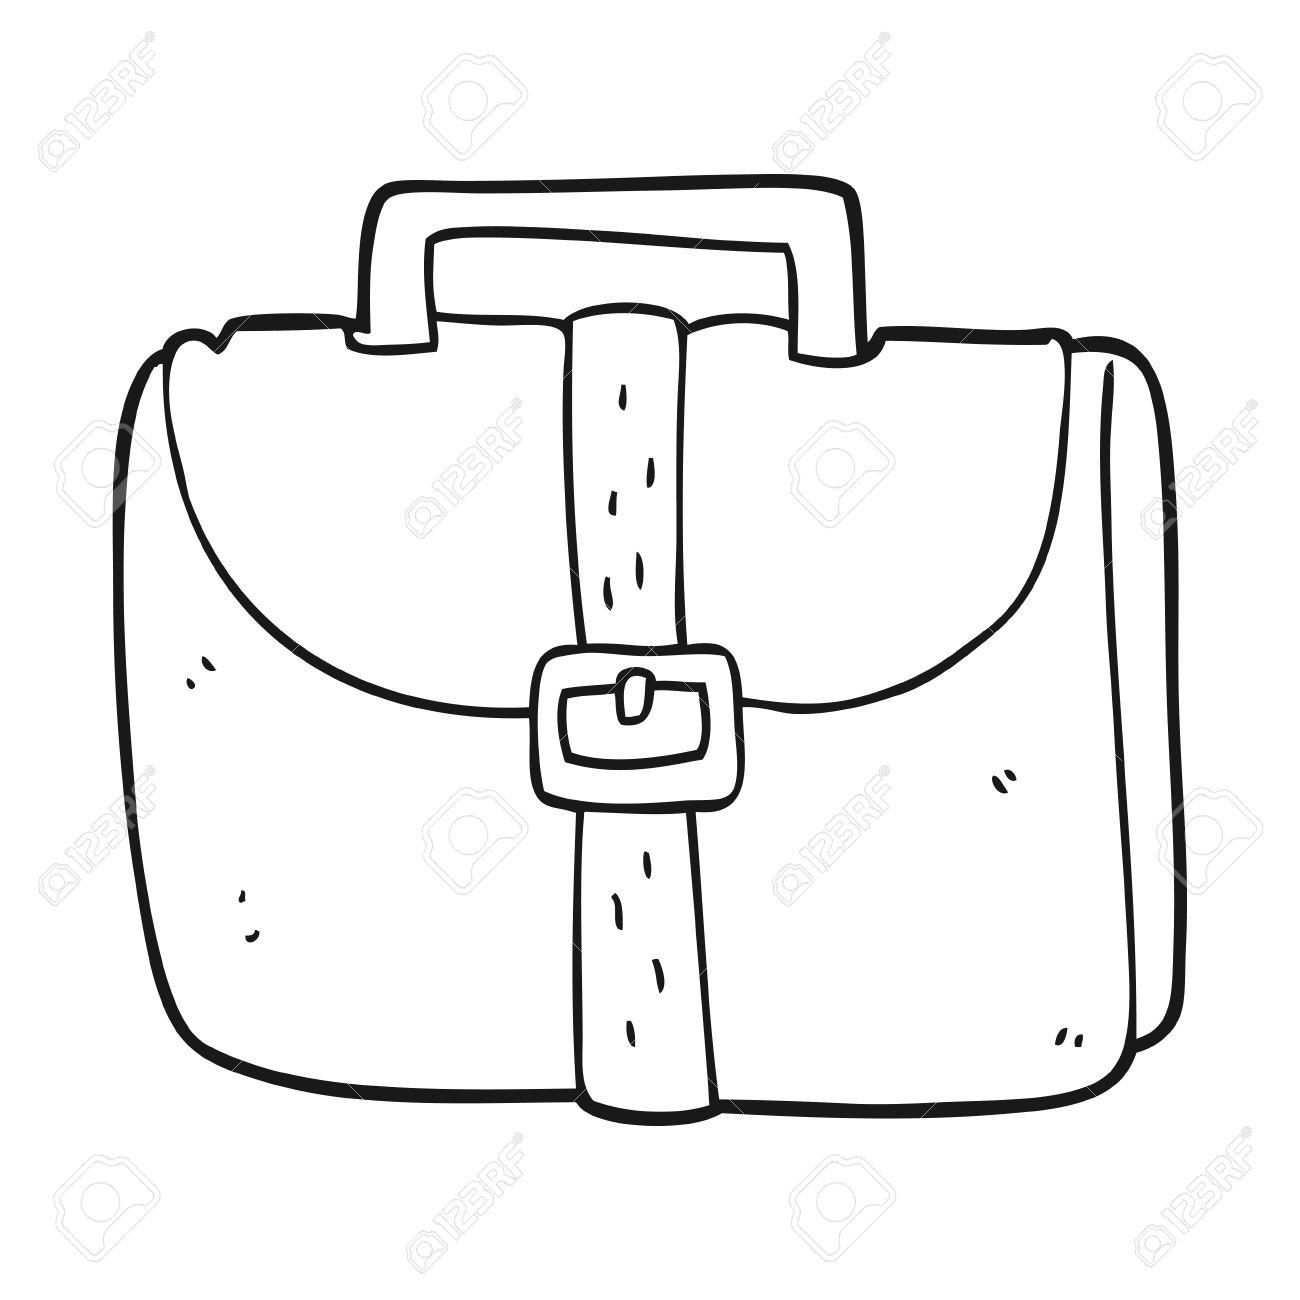 Bag Cliparts | Free download best Bag Cliparts on ClipArtMag.com